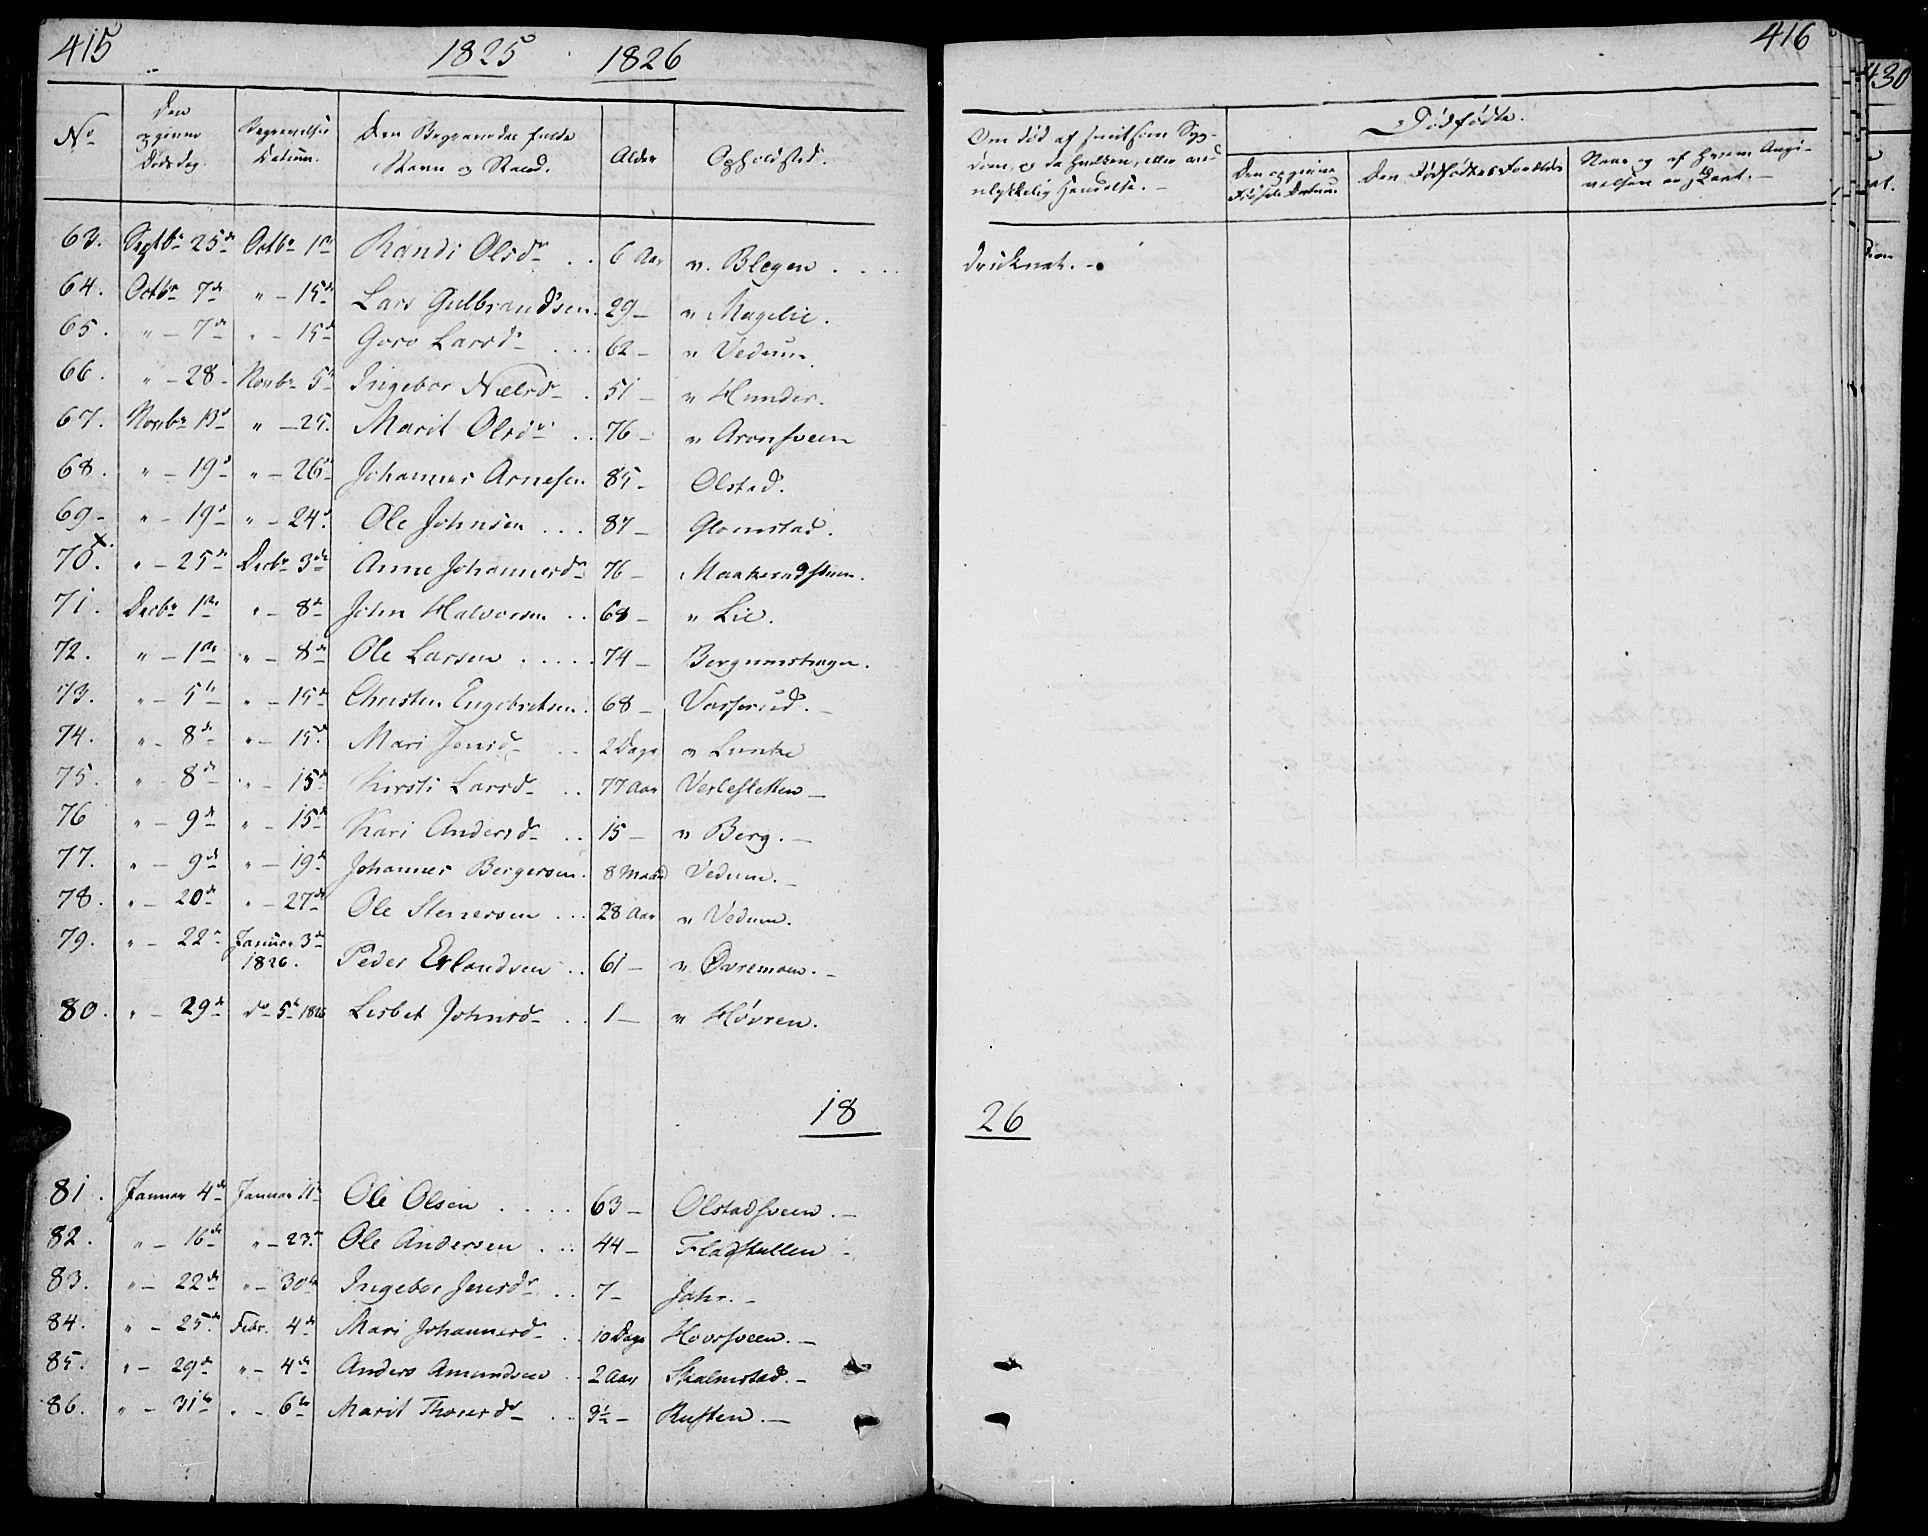 SAH, Øyer prestekontor, Ministerialbok nr. 4, 1824-1841, s. 415-416